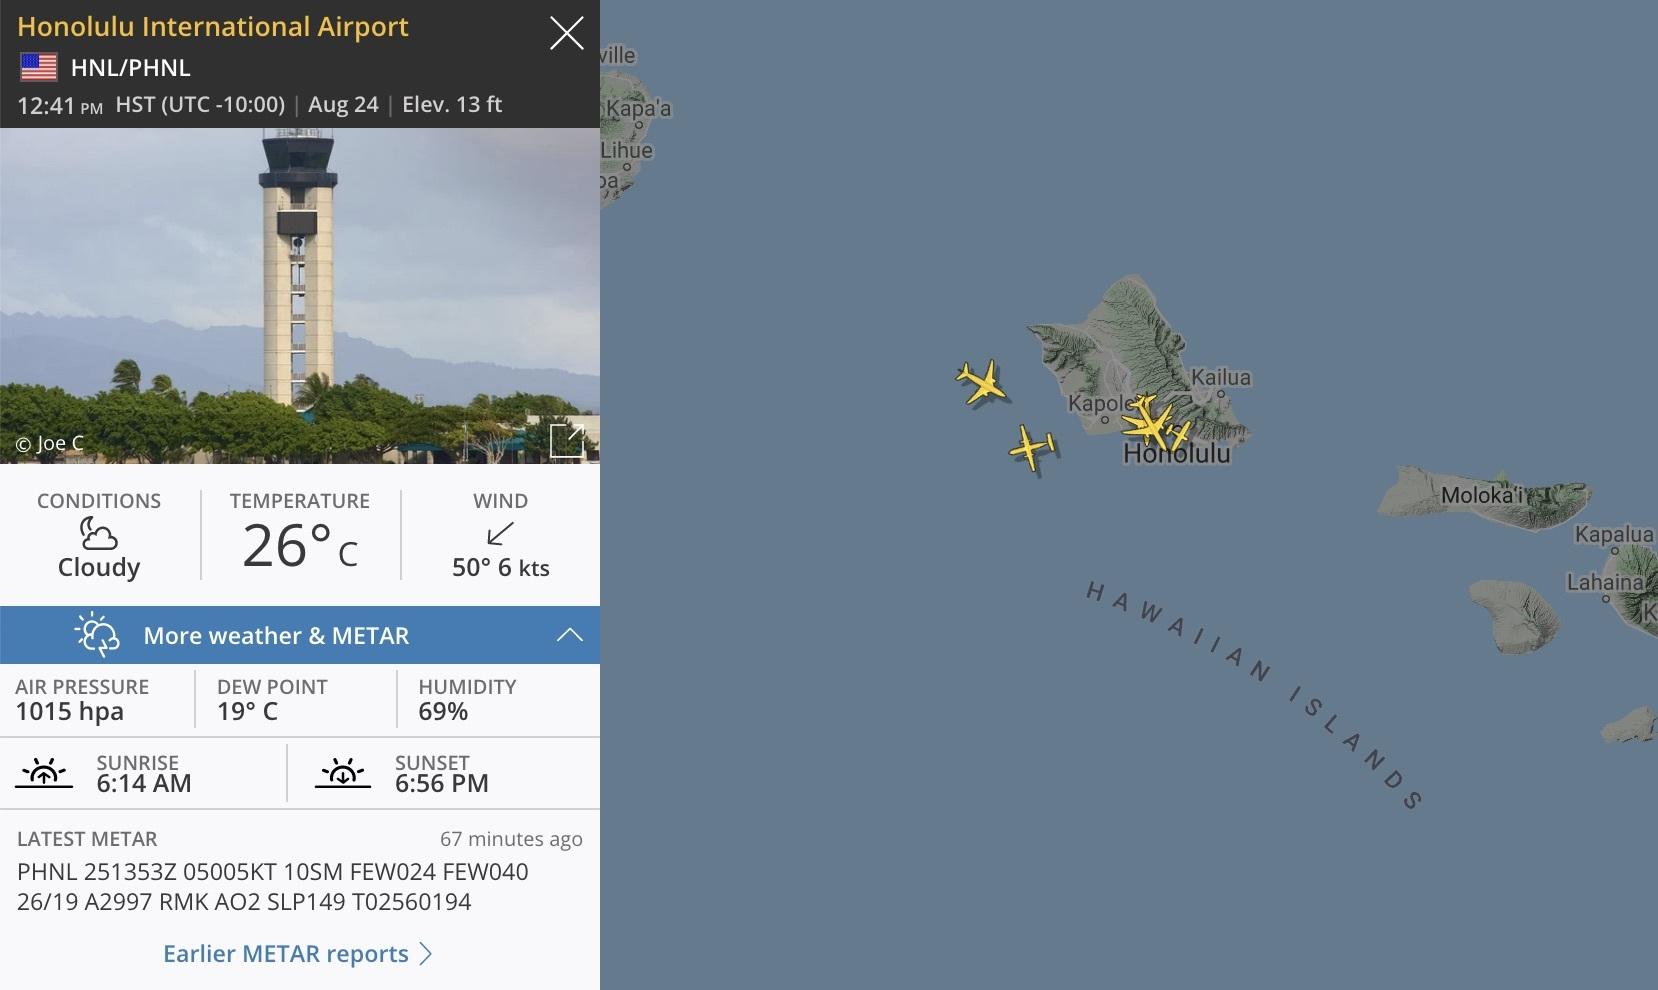 Flightradar24 METAR page HNL